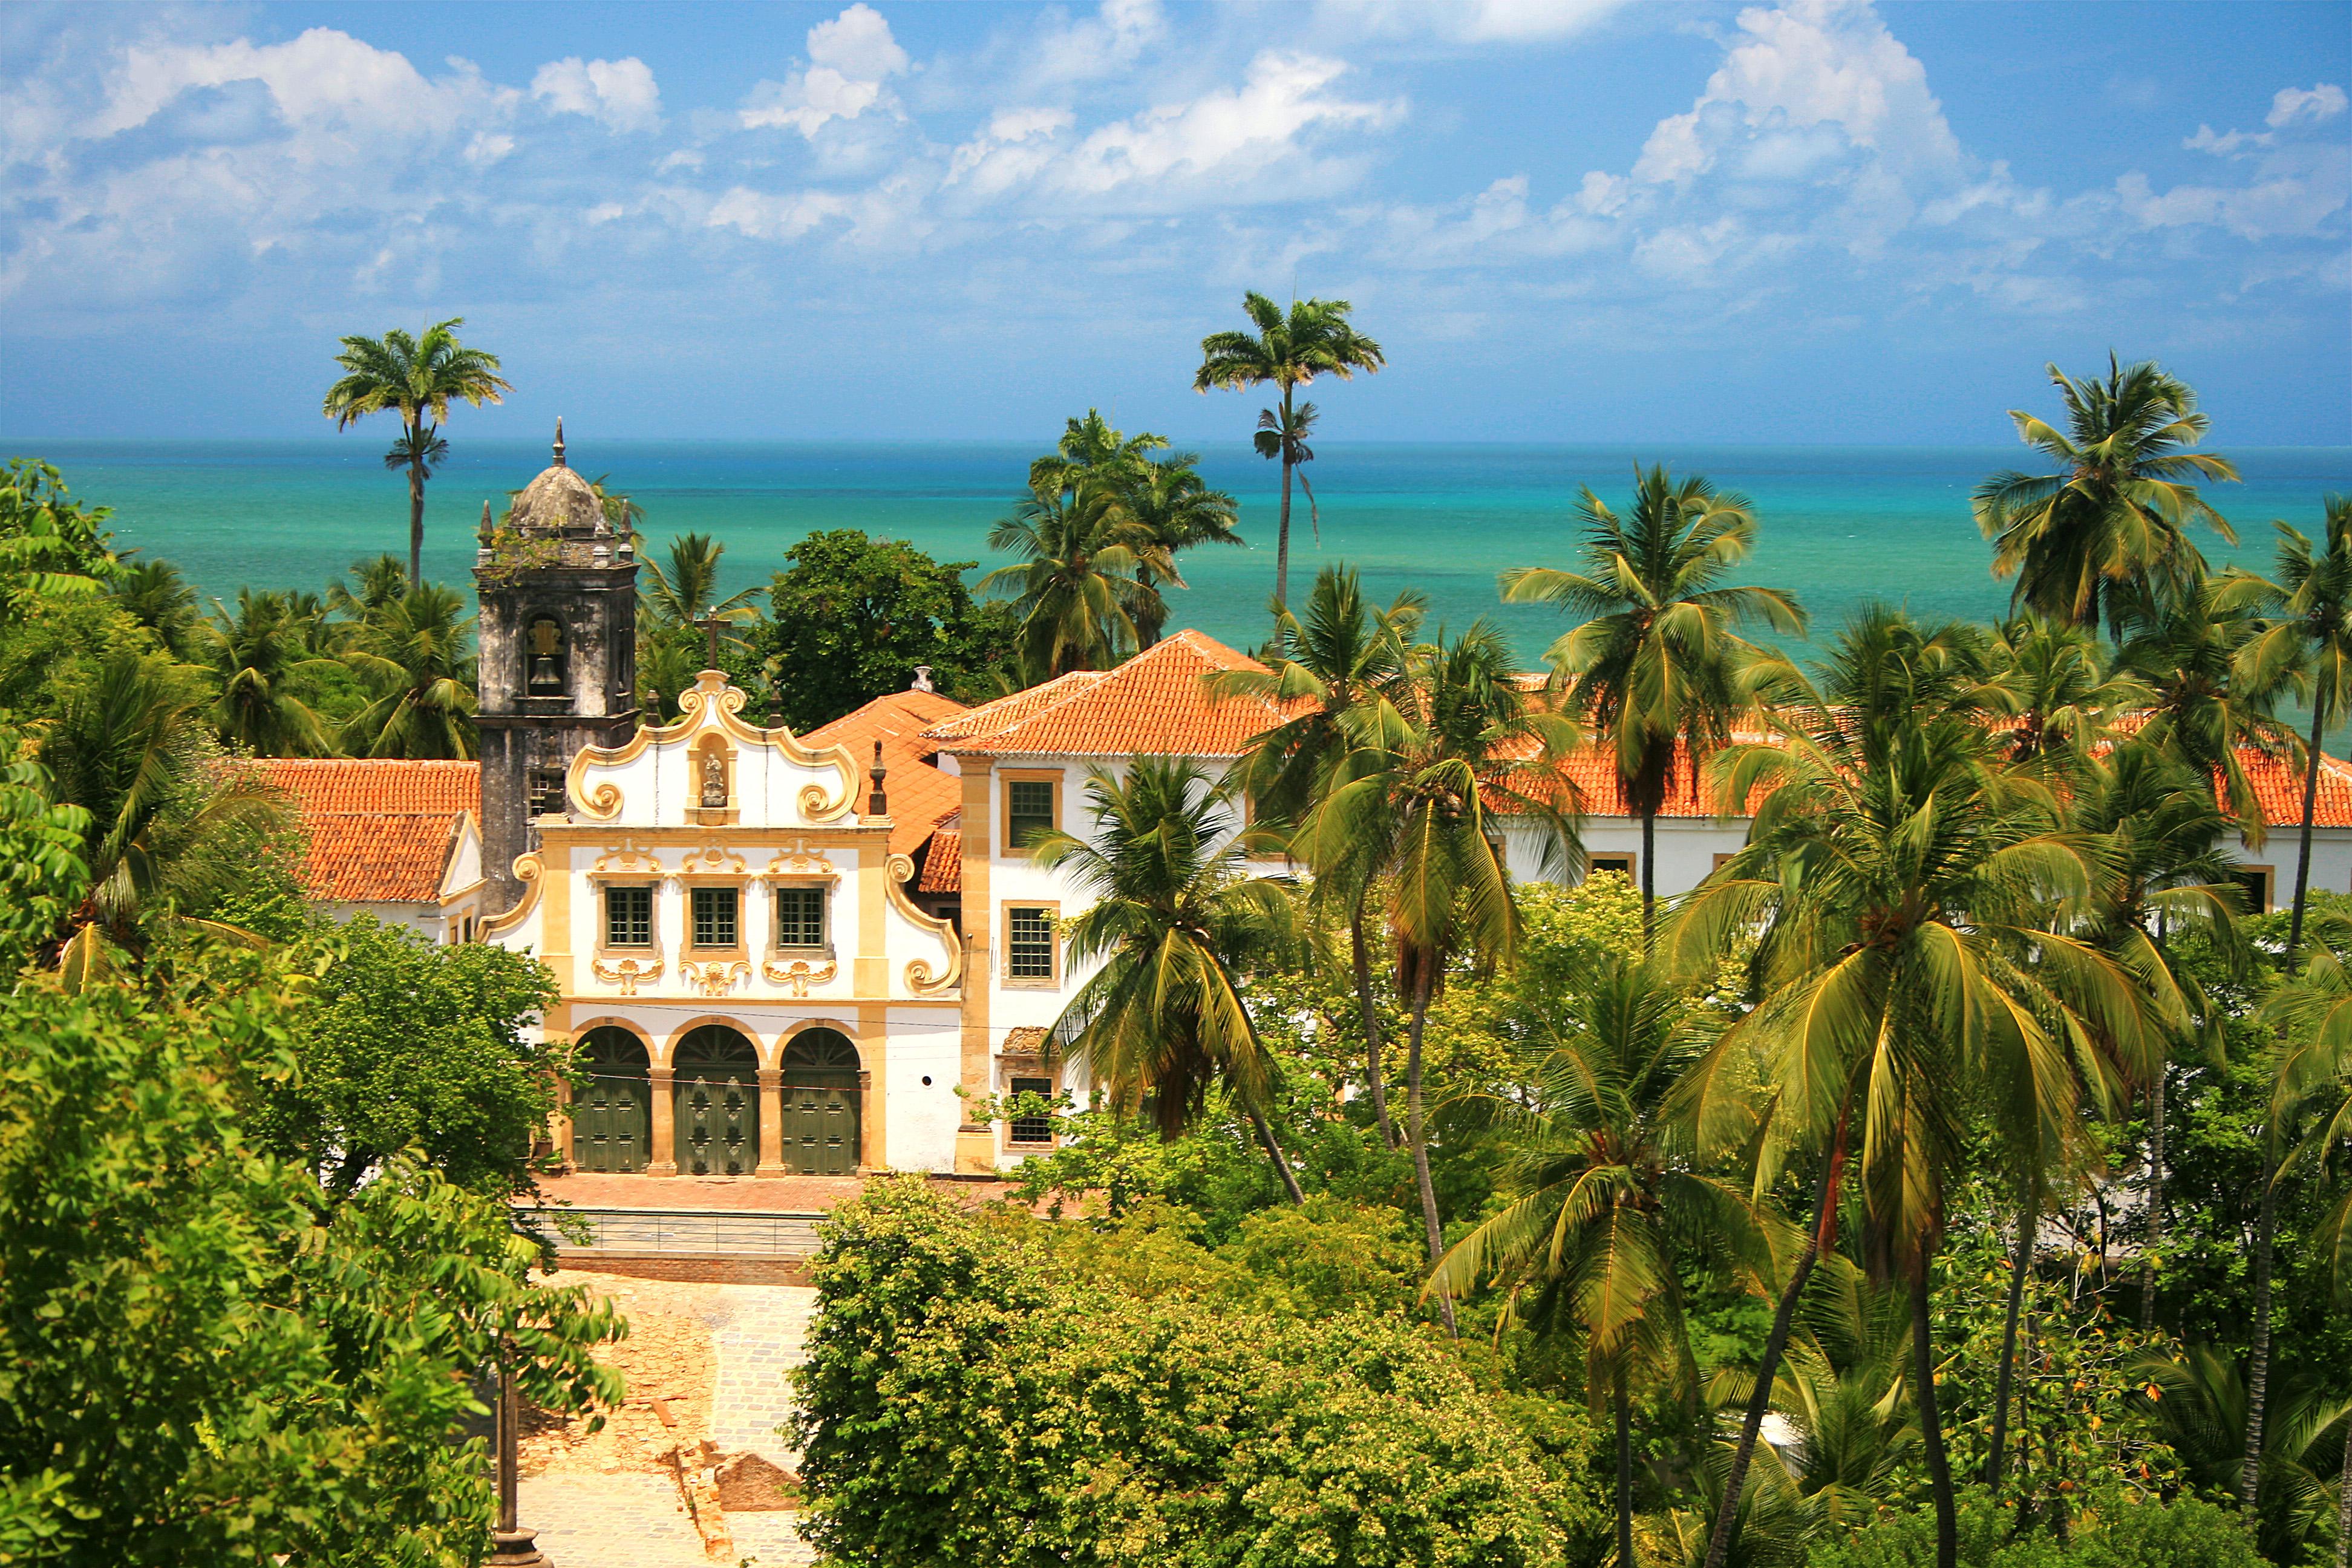 Convento_de_São_Francisco_-_Olinda_-_Pernambuco_-_Brasil